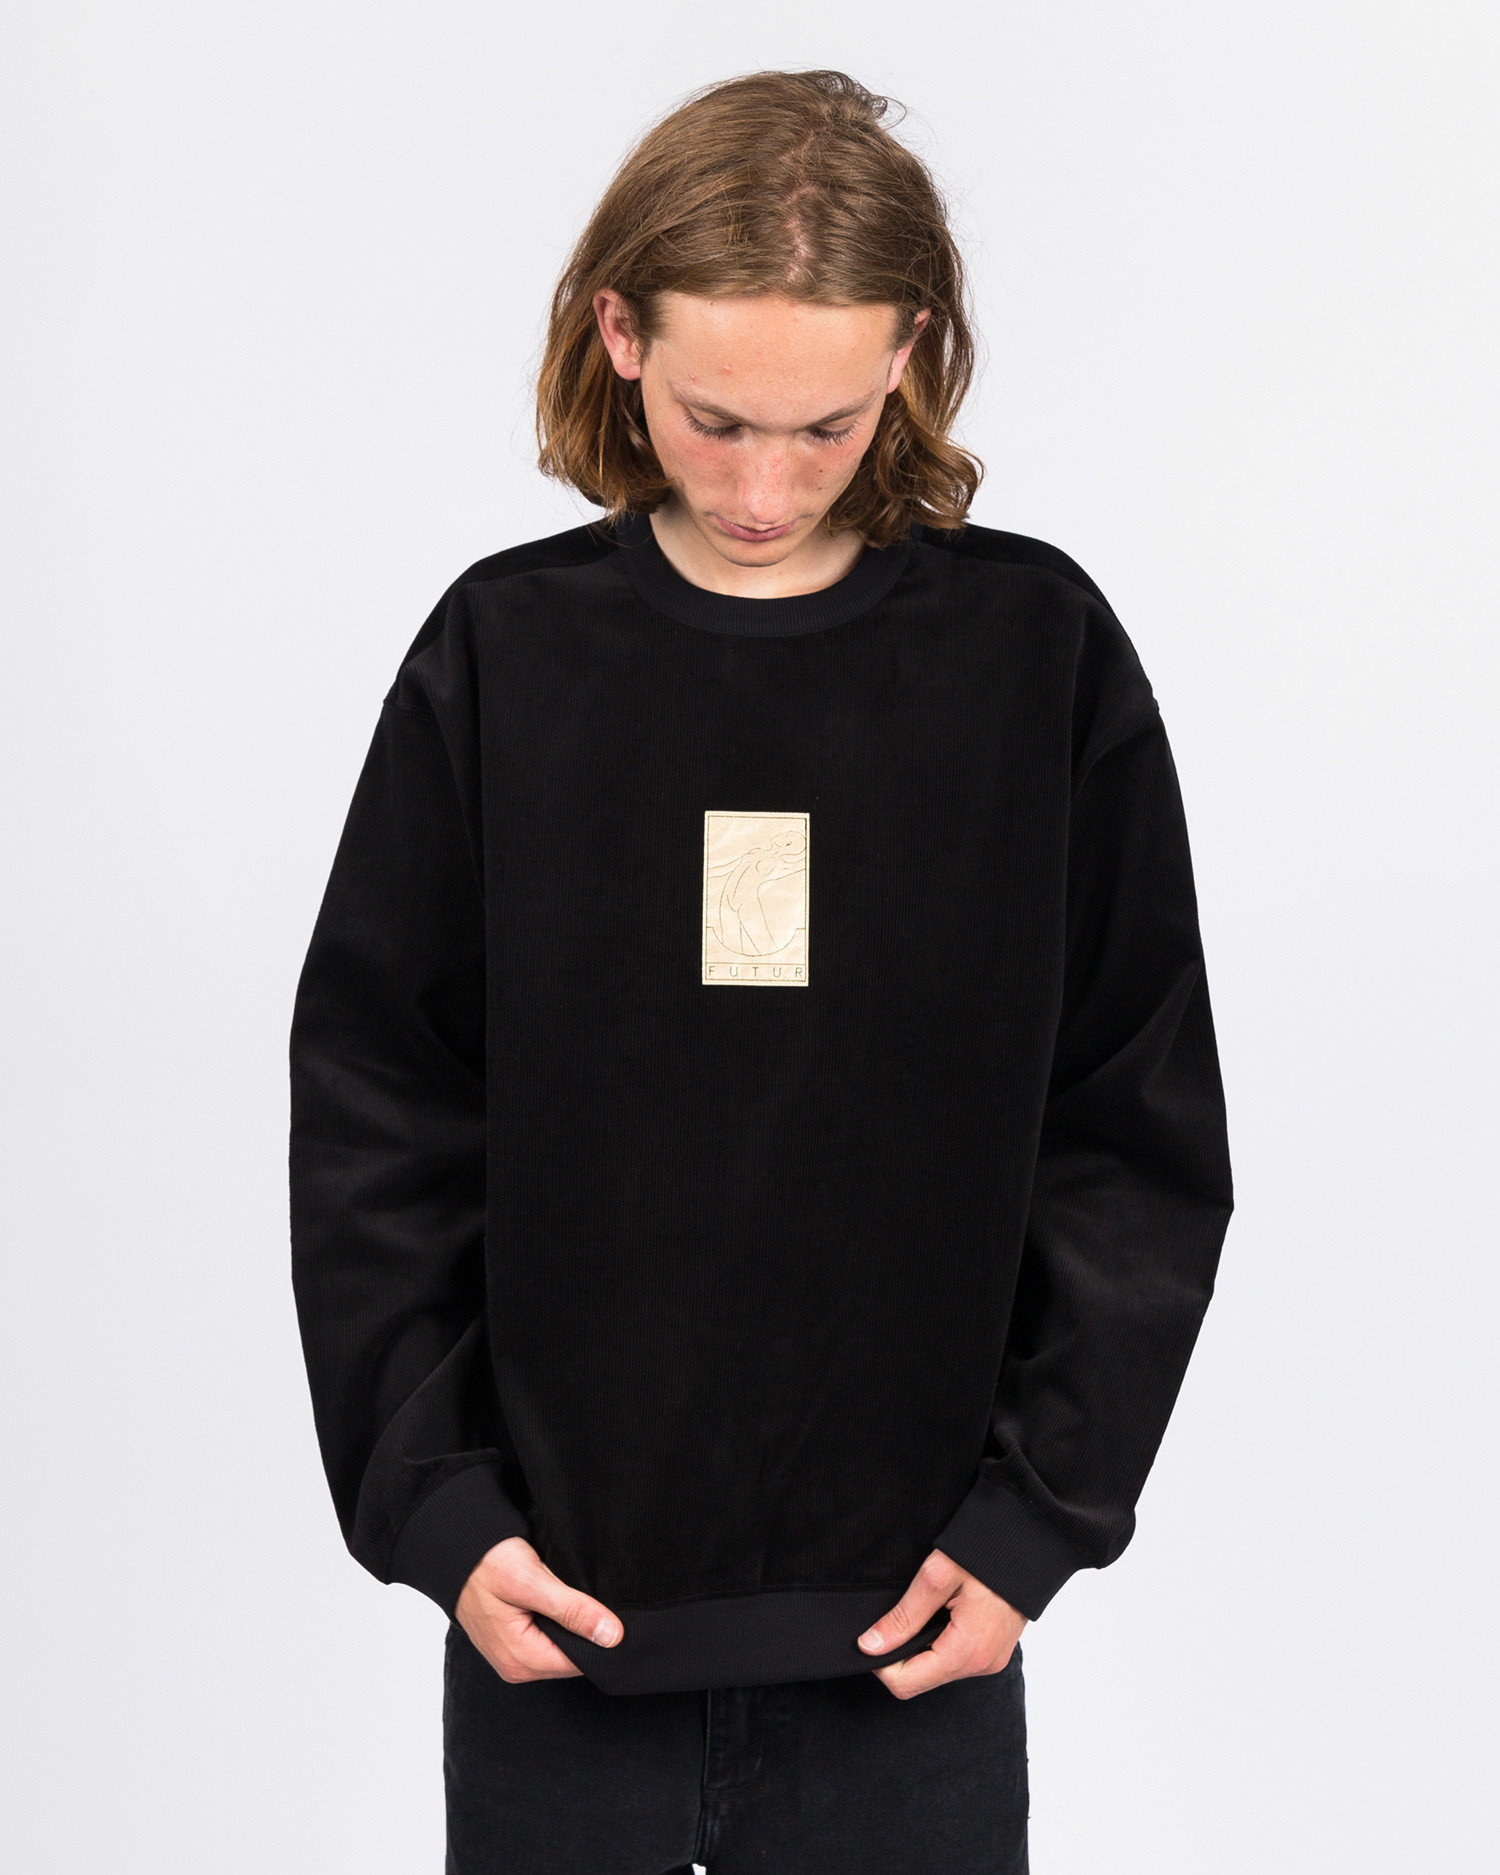 Futur 01 Gold Cord G Fit Crew Black